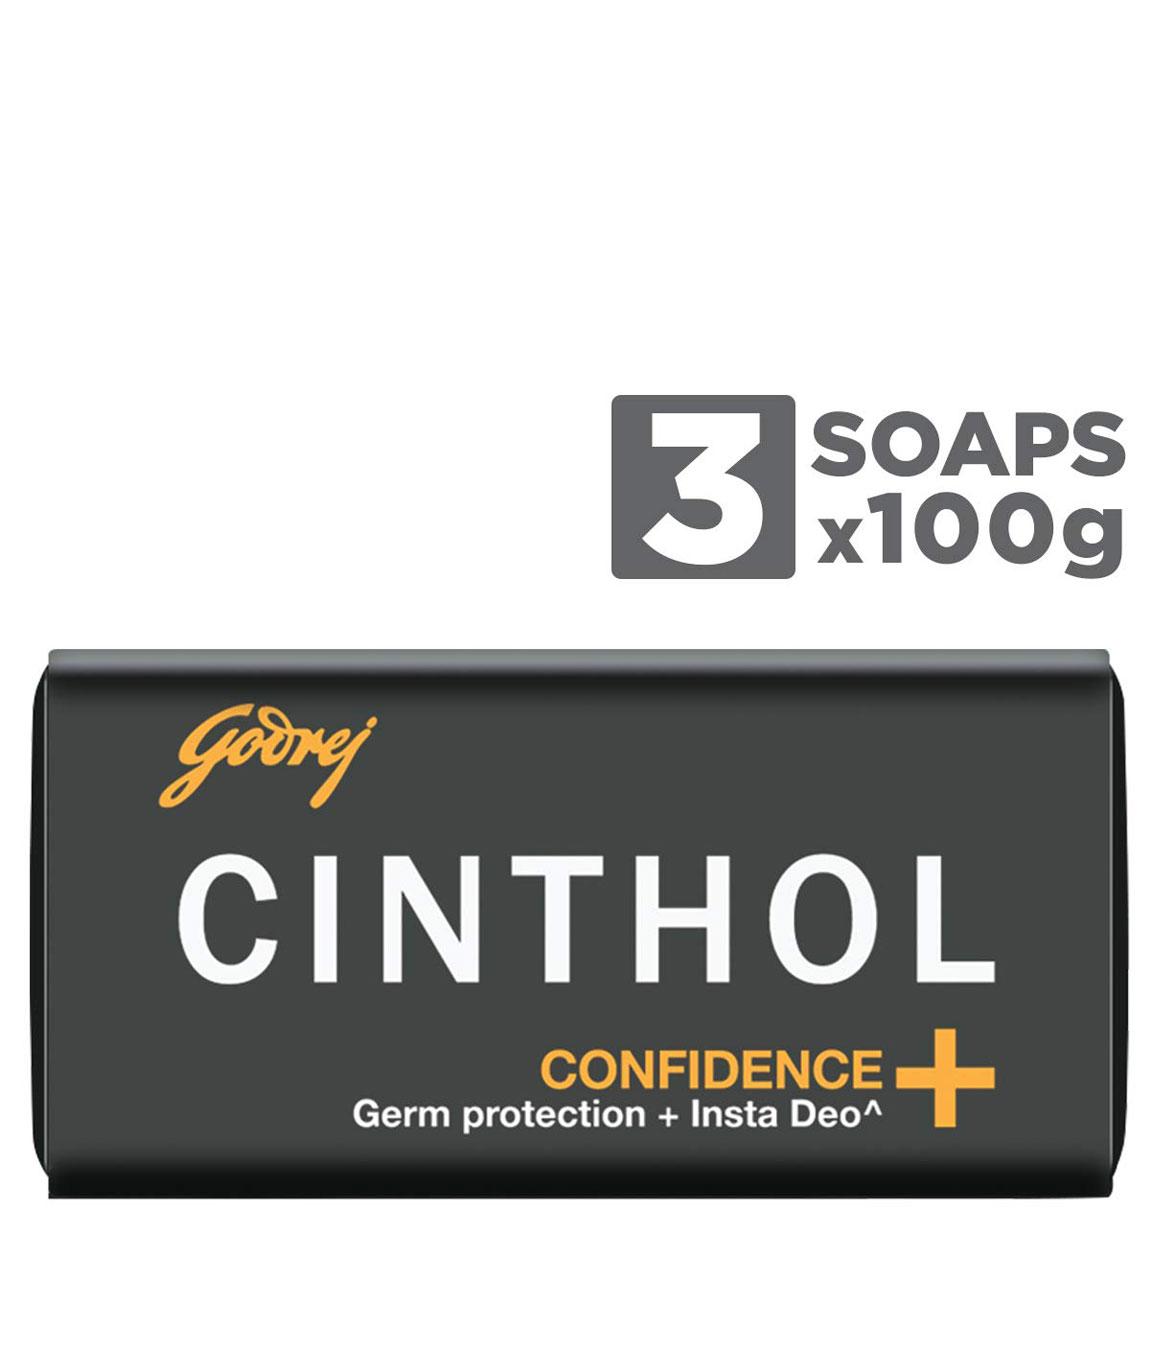 Cinthol Confidence+ Bath Soap, 100g (Pack of 3)